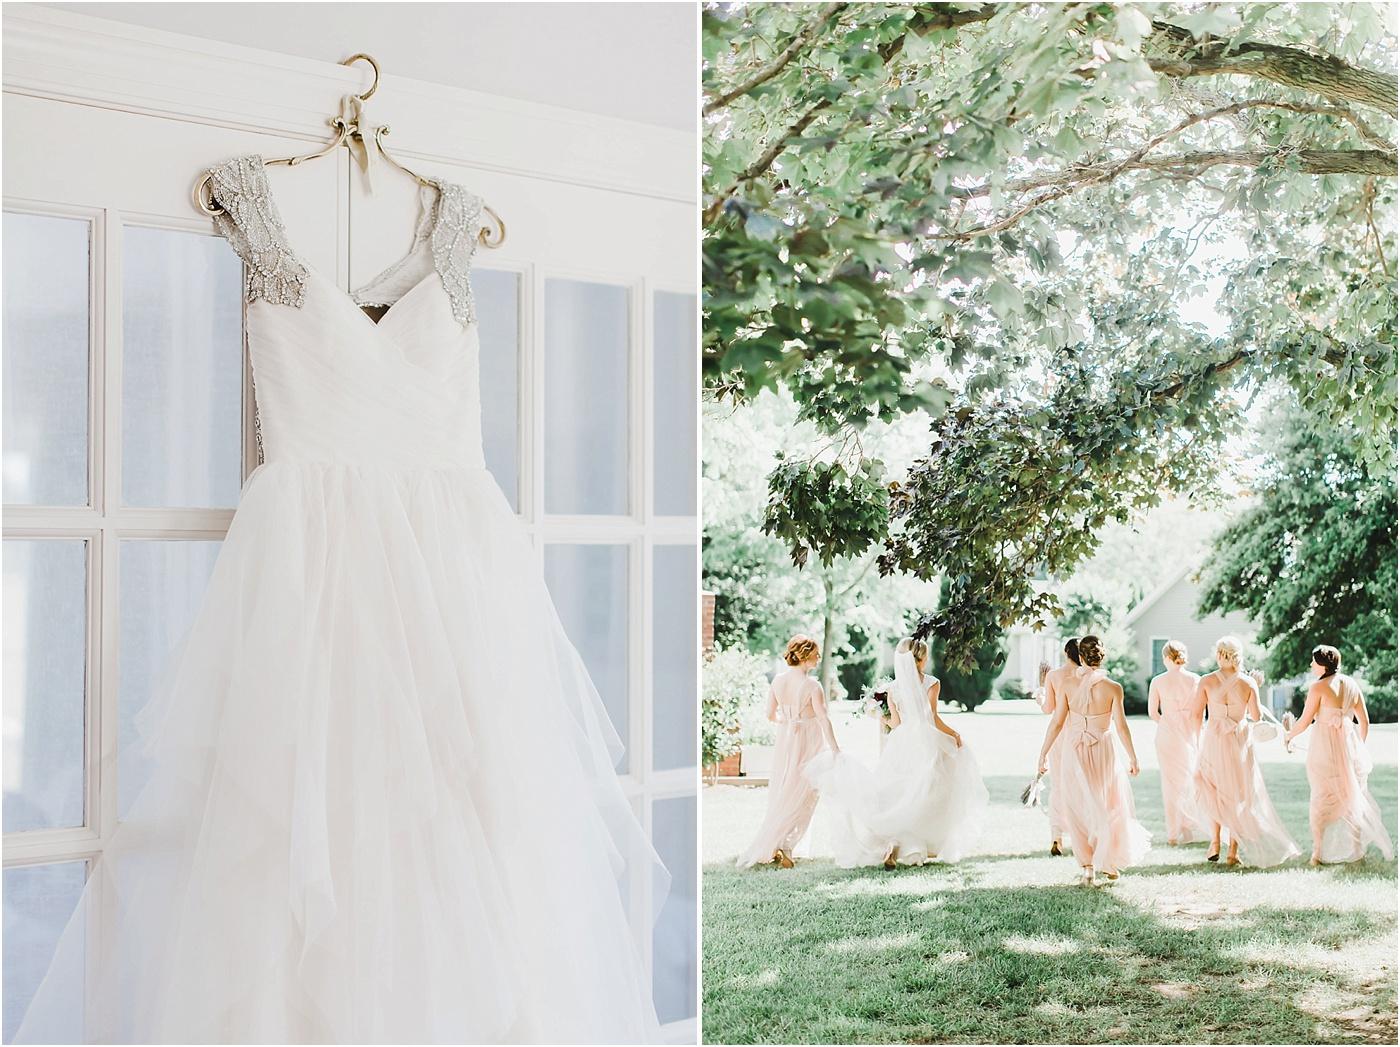 Beaded Hayley Paige Bridal Gown + Blush Jenny Yoo Bridesmaid Dresses